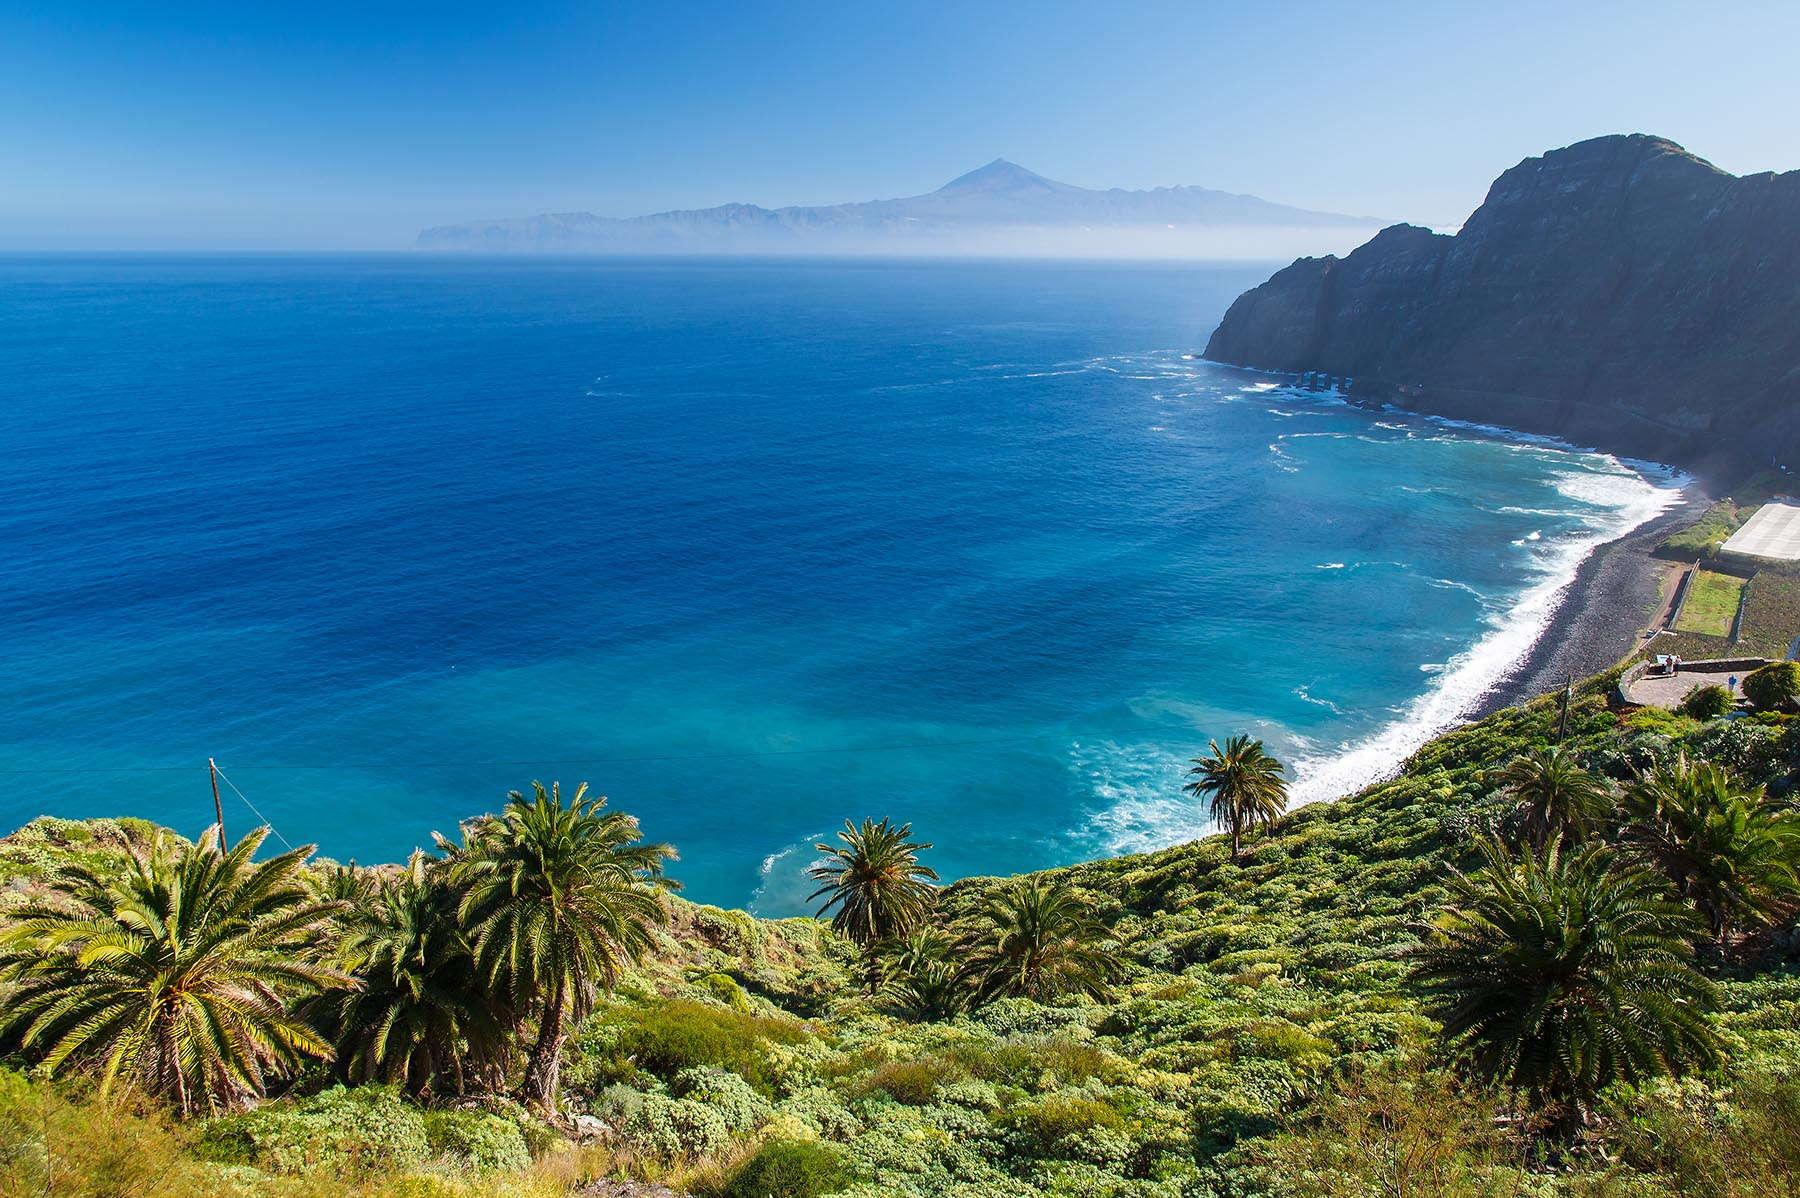 Остров Тенерифе, Канарские острова — подробная информация с фото